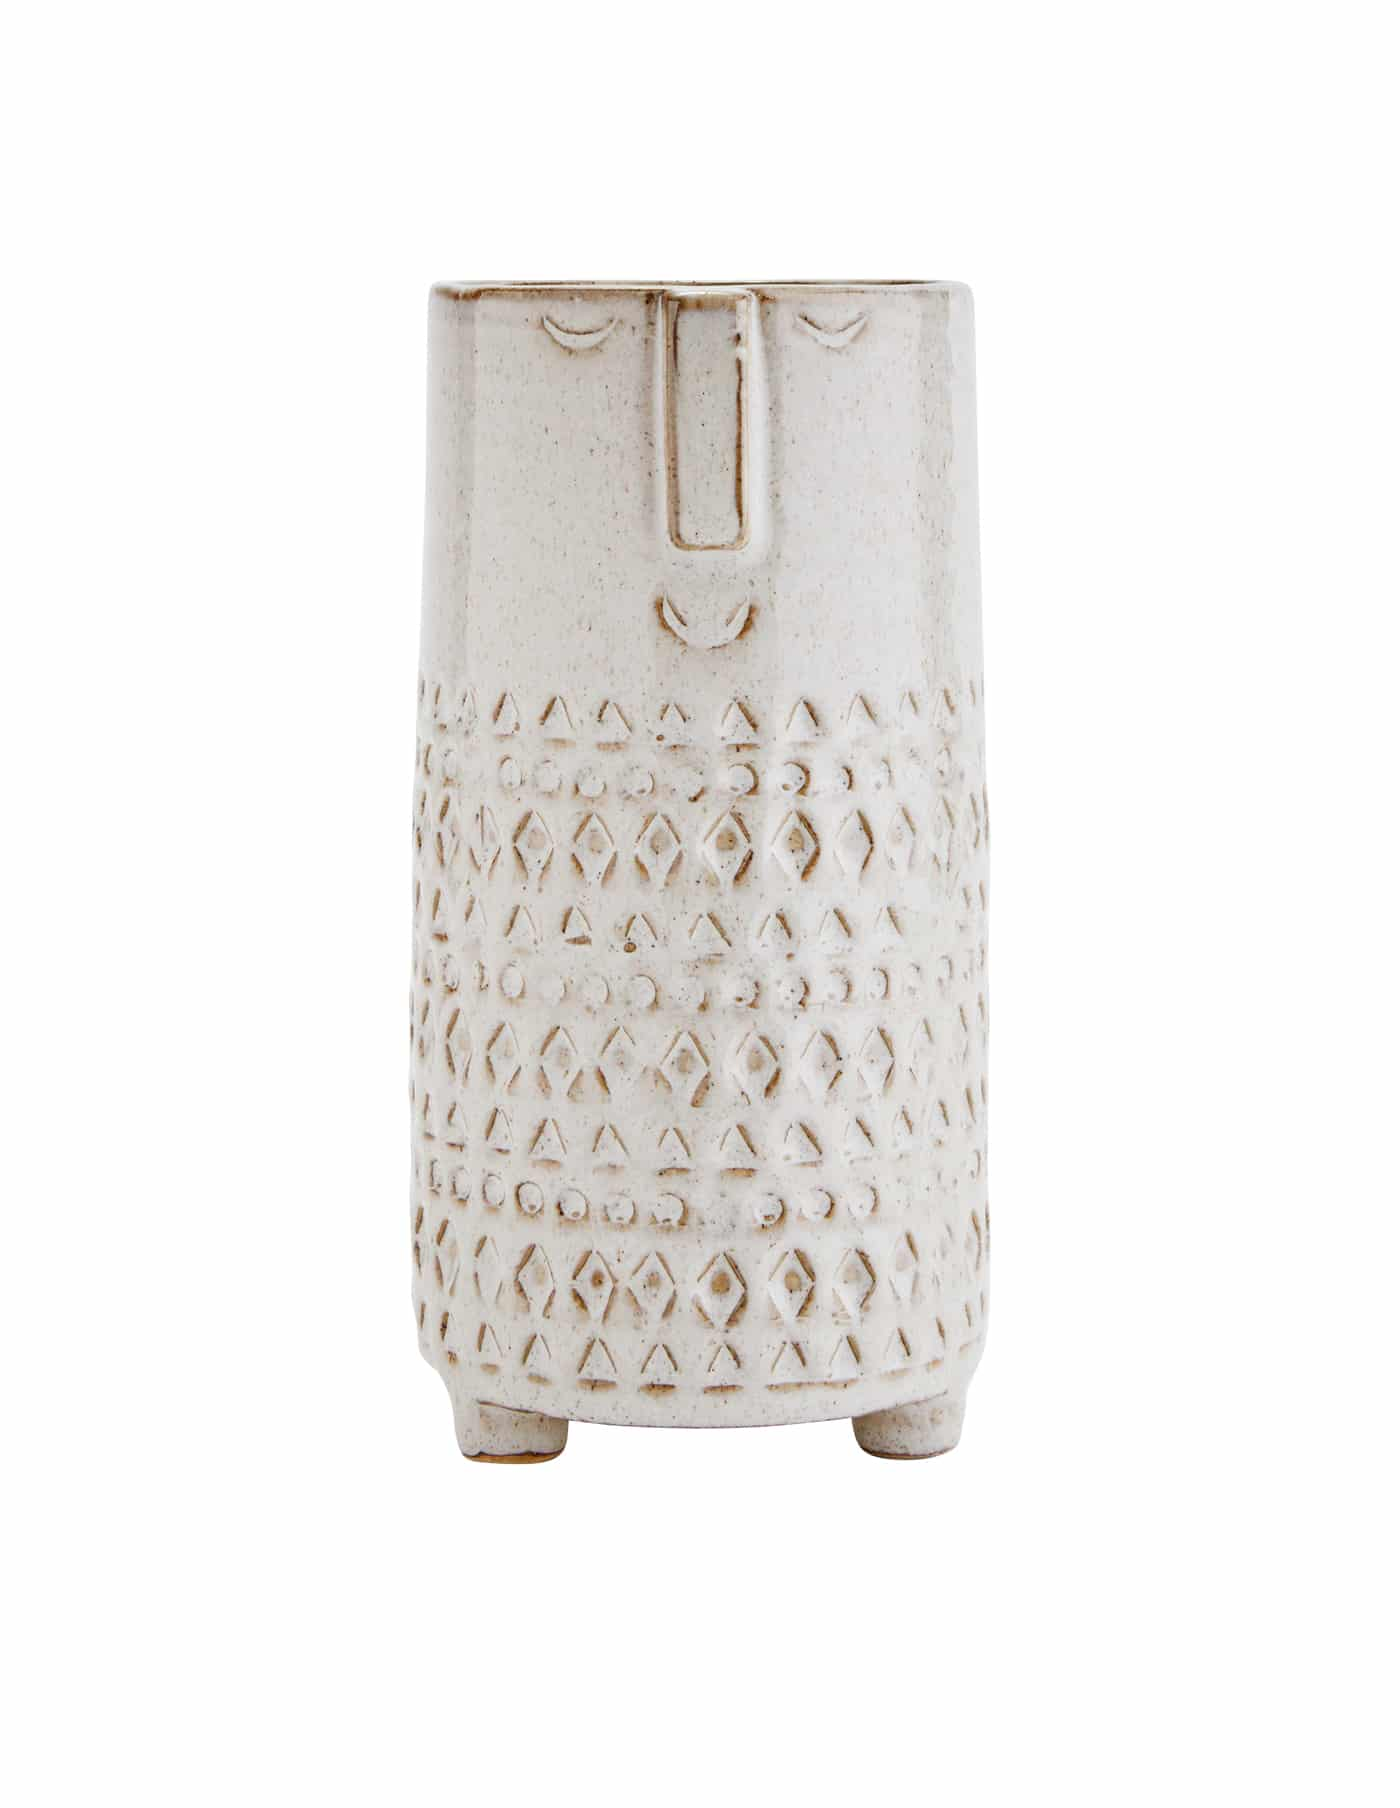 Madam Stoltz Vase with Face Imprint